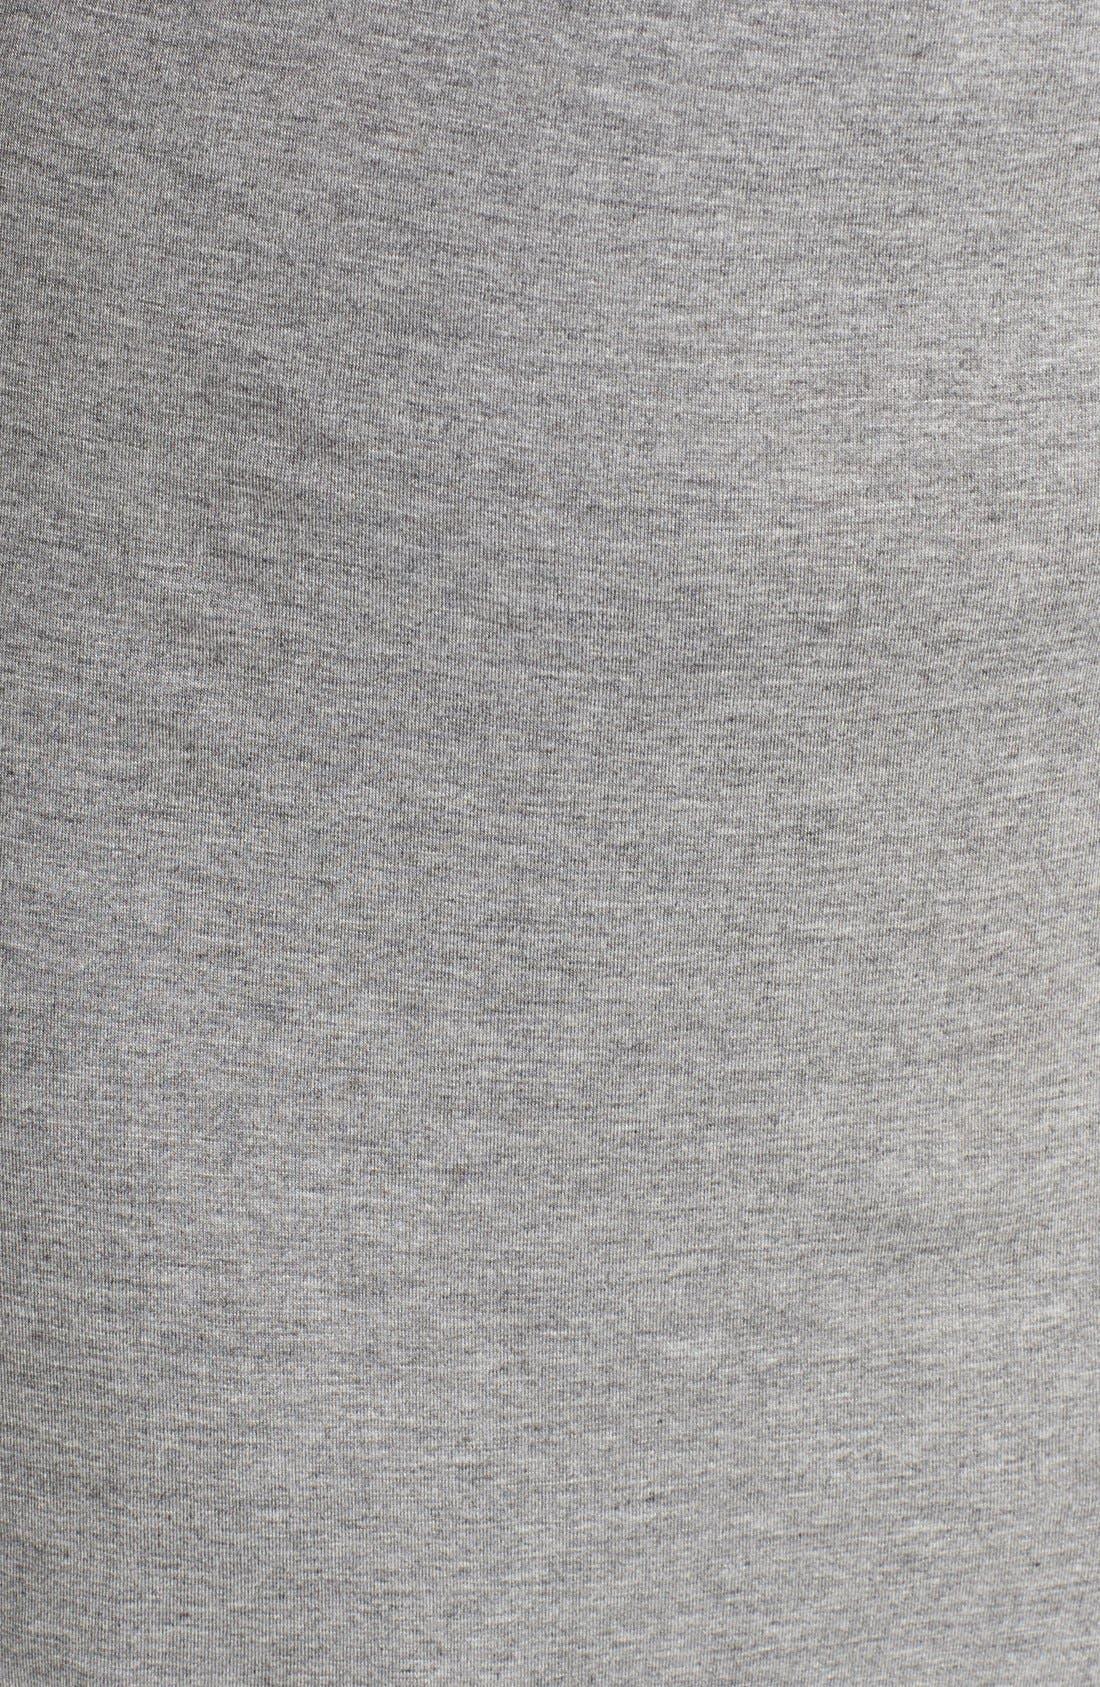 Alternate Image 5  - Honeydew Intimates 'All American Frisky' Chemise (Plus Size)